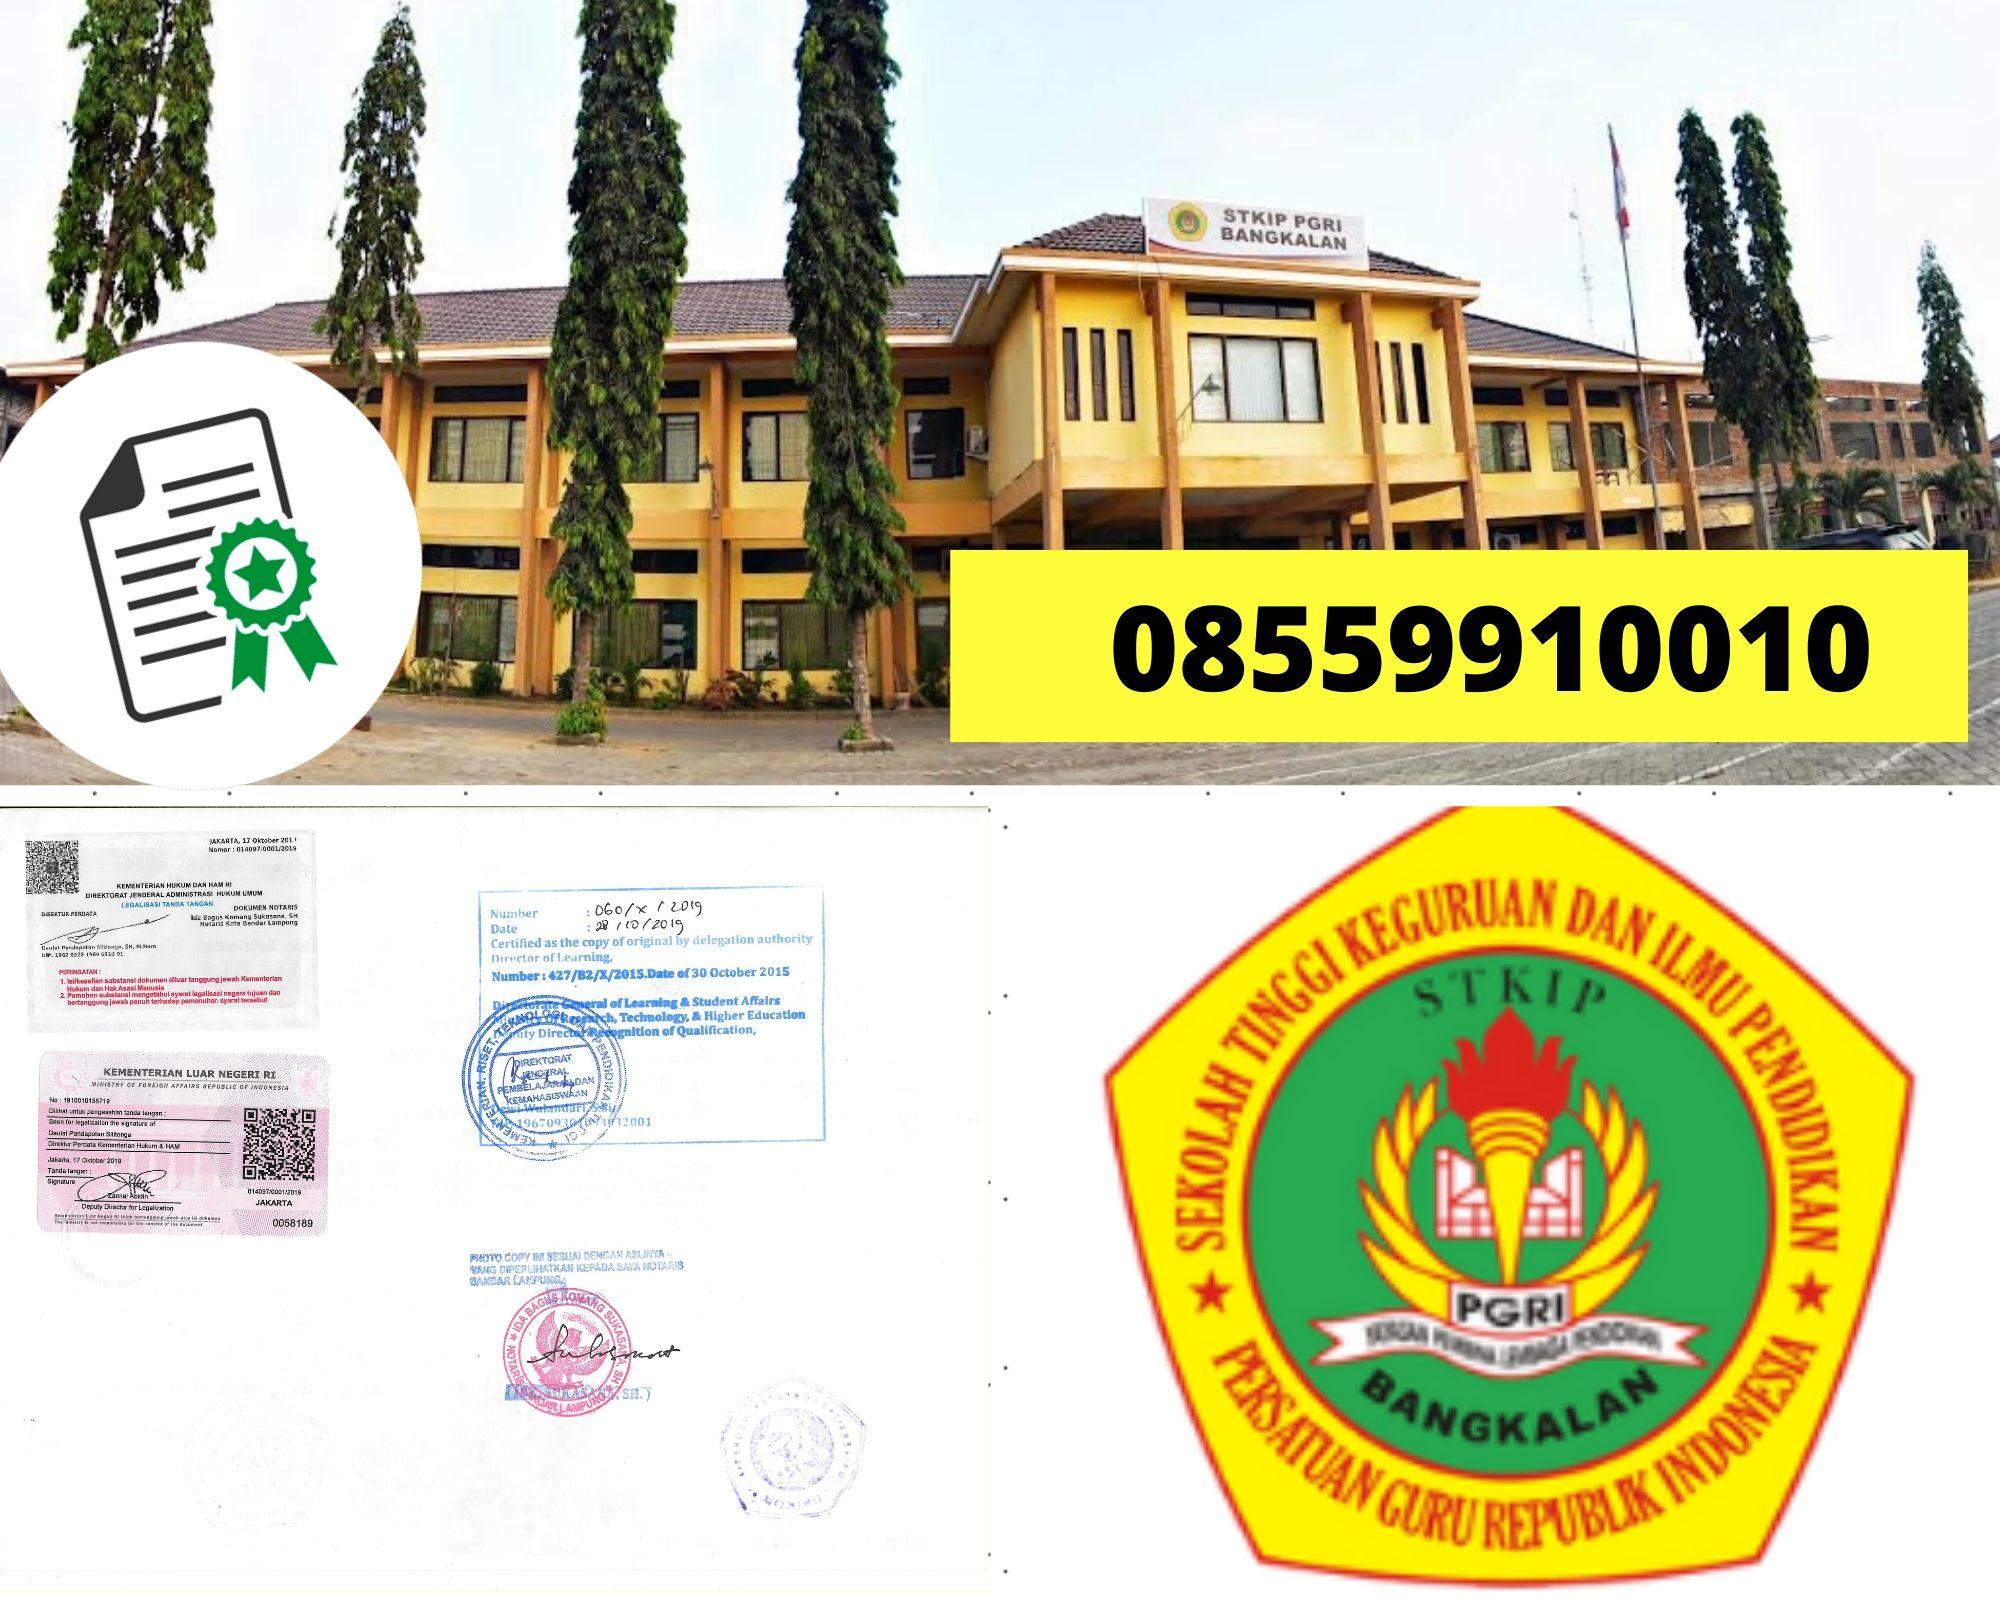 Legalisir Ijazah STKIP PGRI Bangkalan Di Kemenristek Dikti || 08559910010